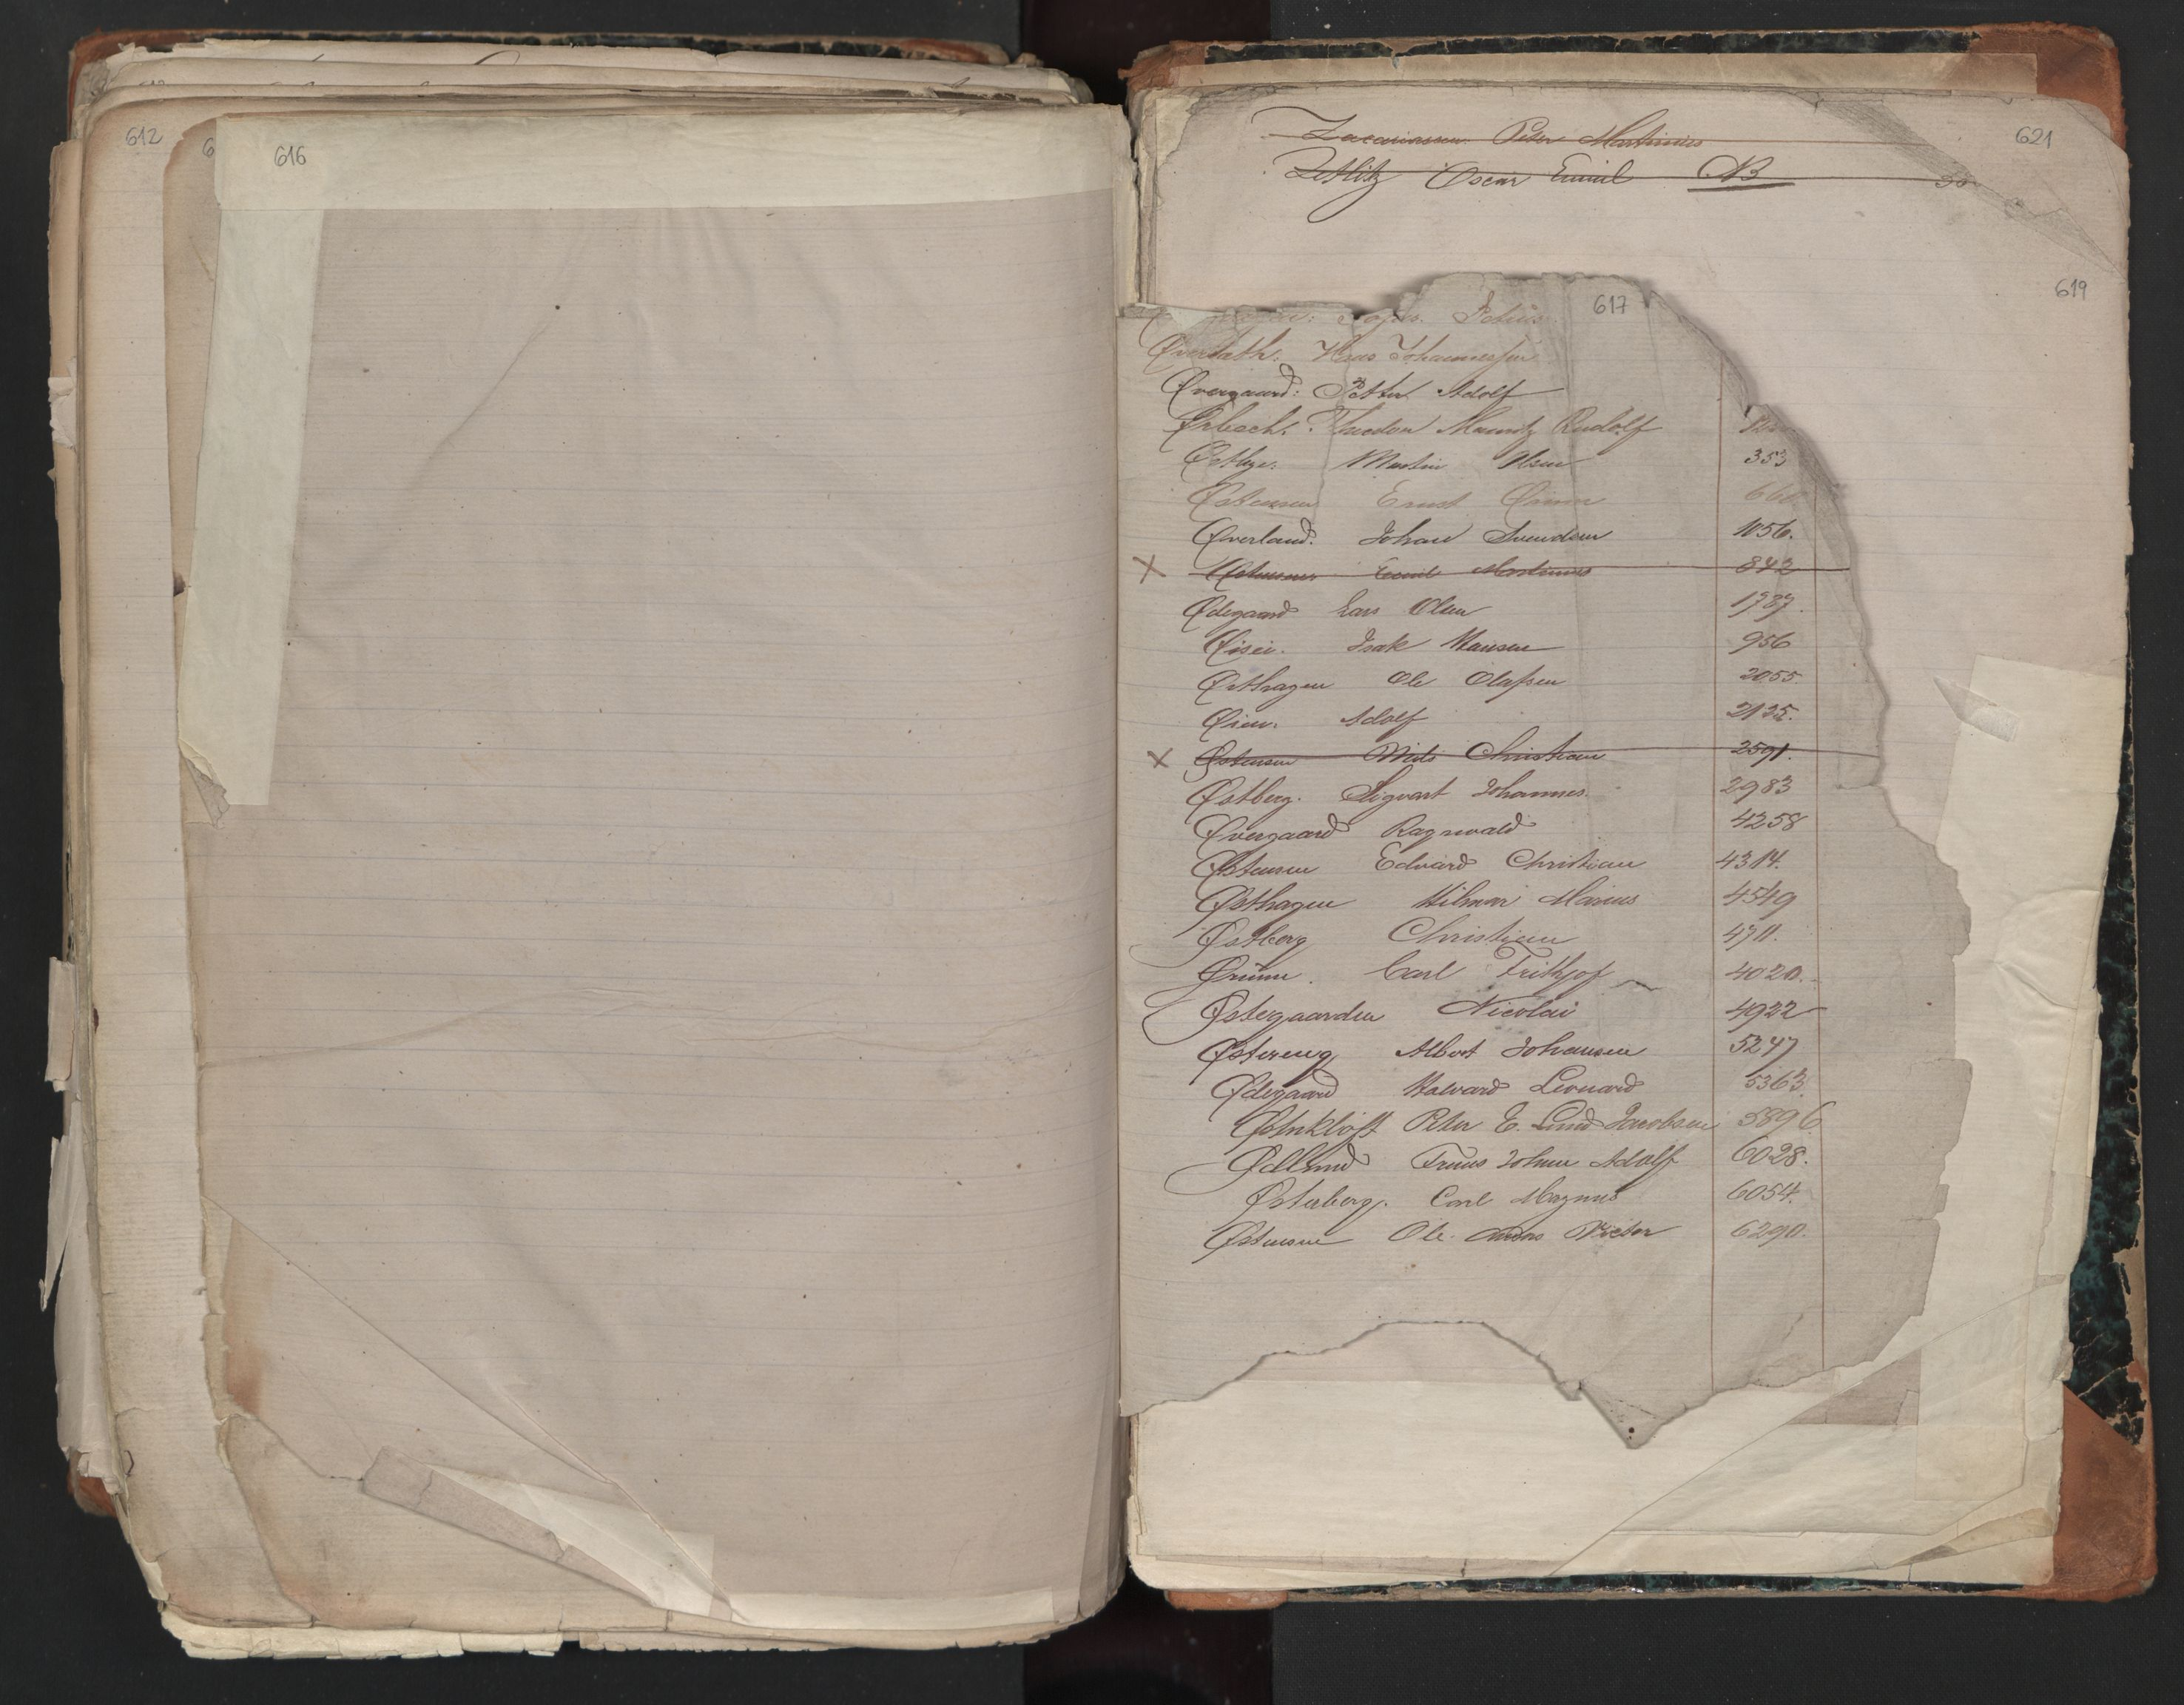 SAO, Oslo sjømannskontor, F/Fa/L0001: Register for Kristiania krets, 1866-1891, s. 616-617